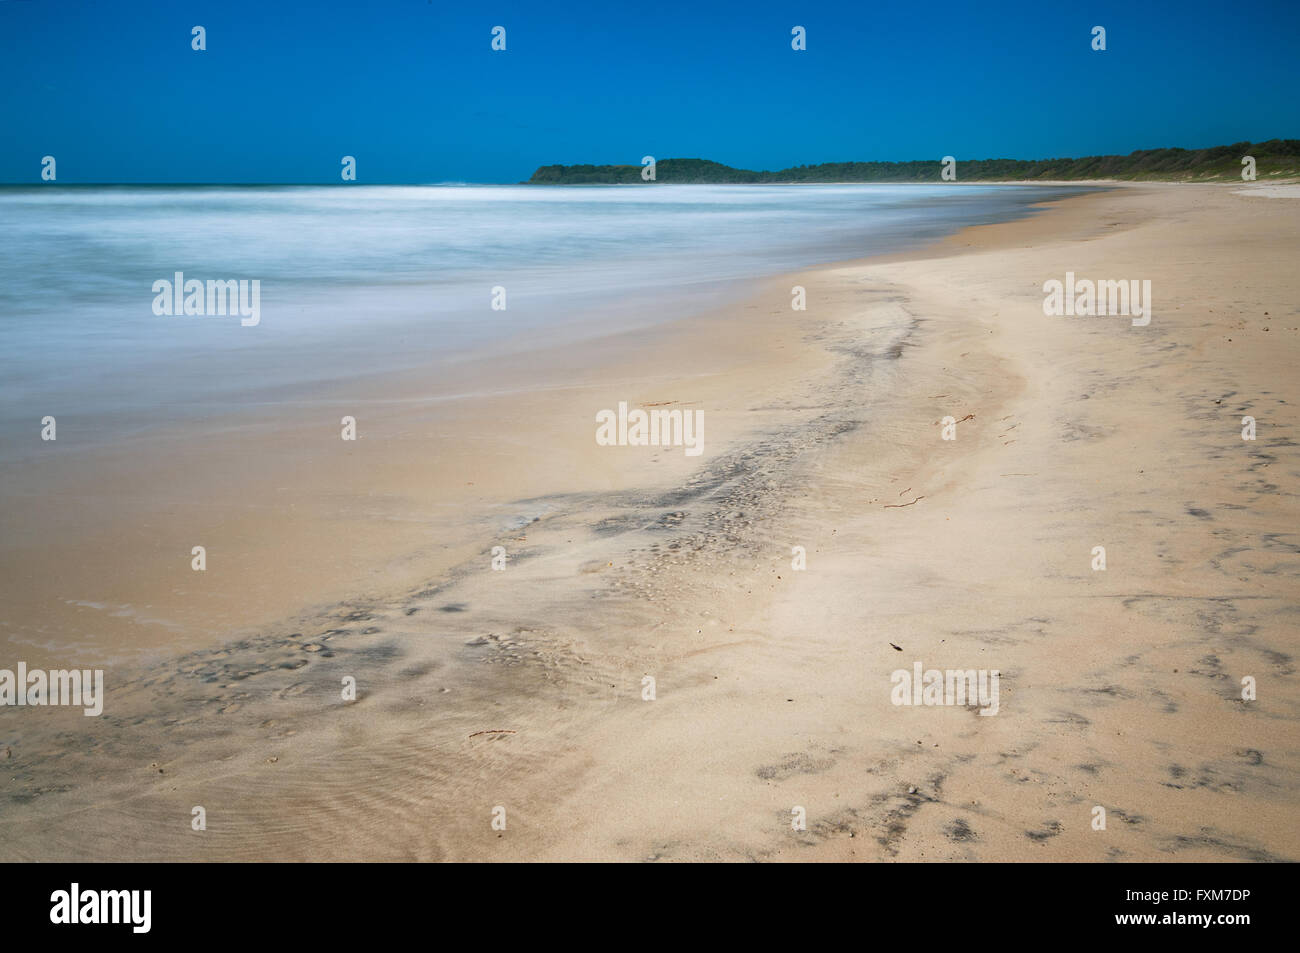 Bluff Beach in Bundjalung National Park. - Stock Image